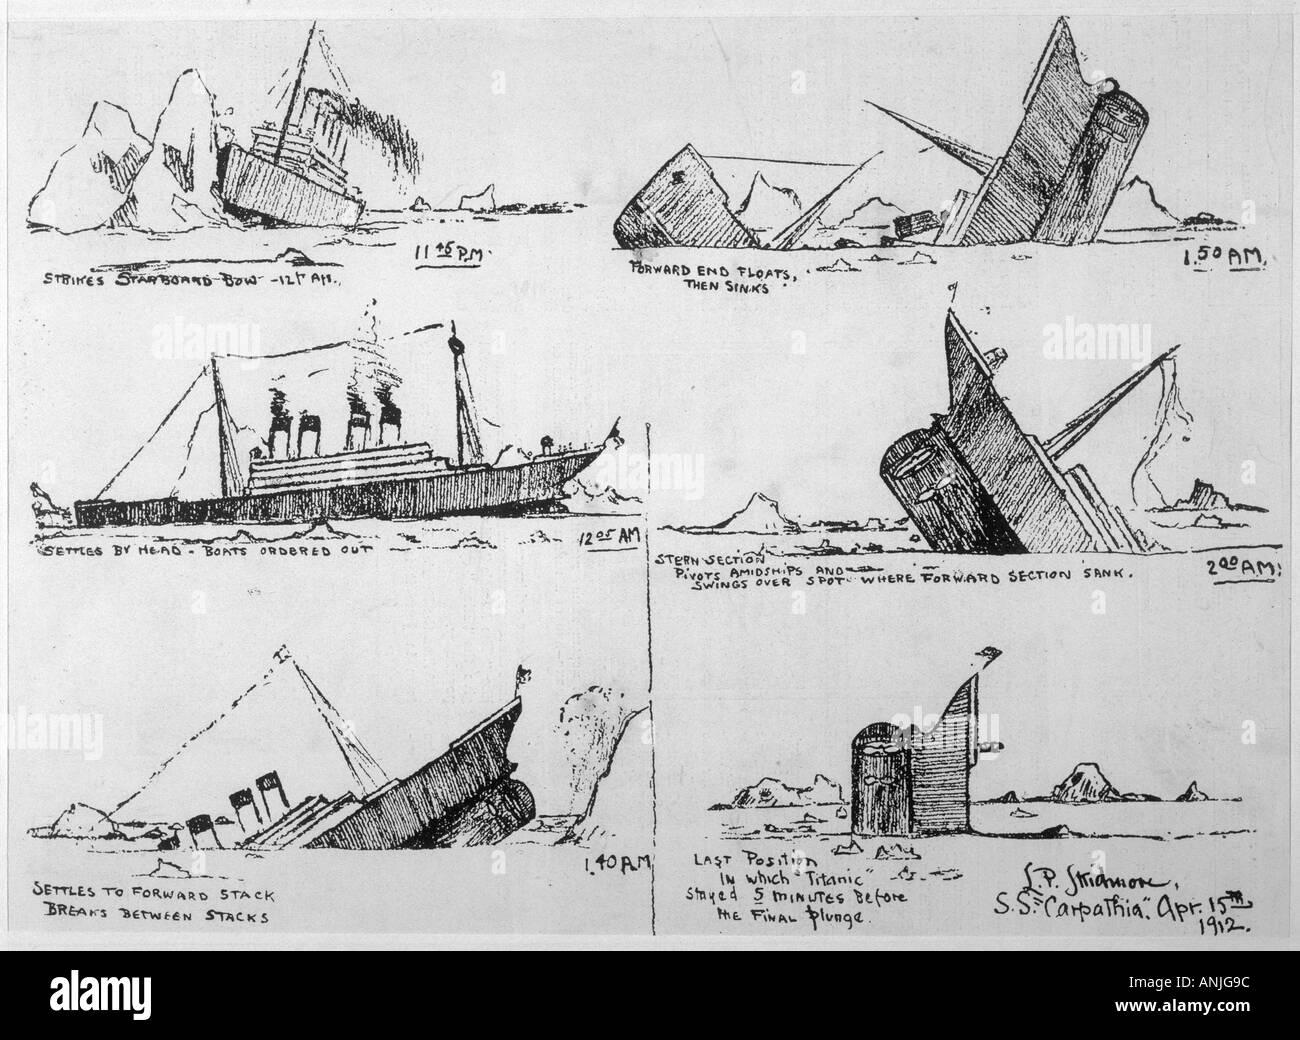 Titanic Sinking Sequence Stock Photo 5073051 Alamy